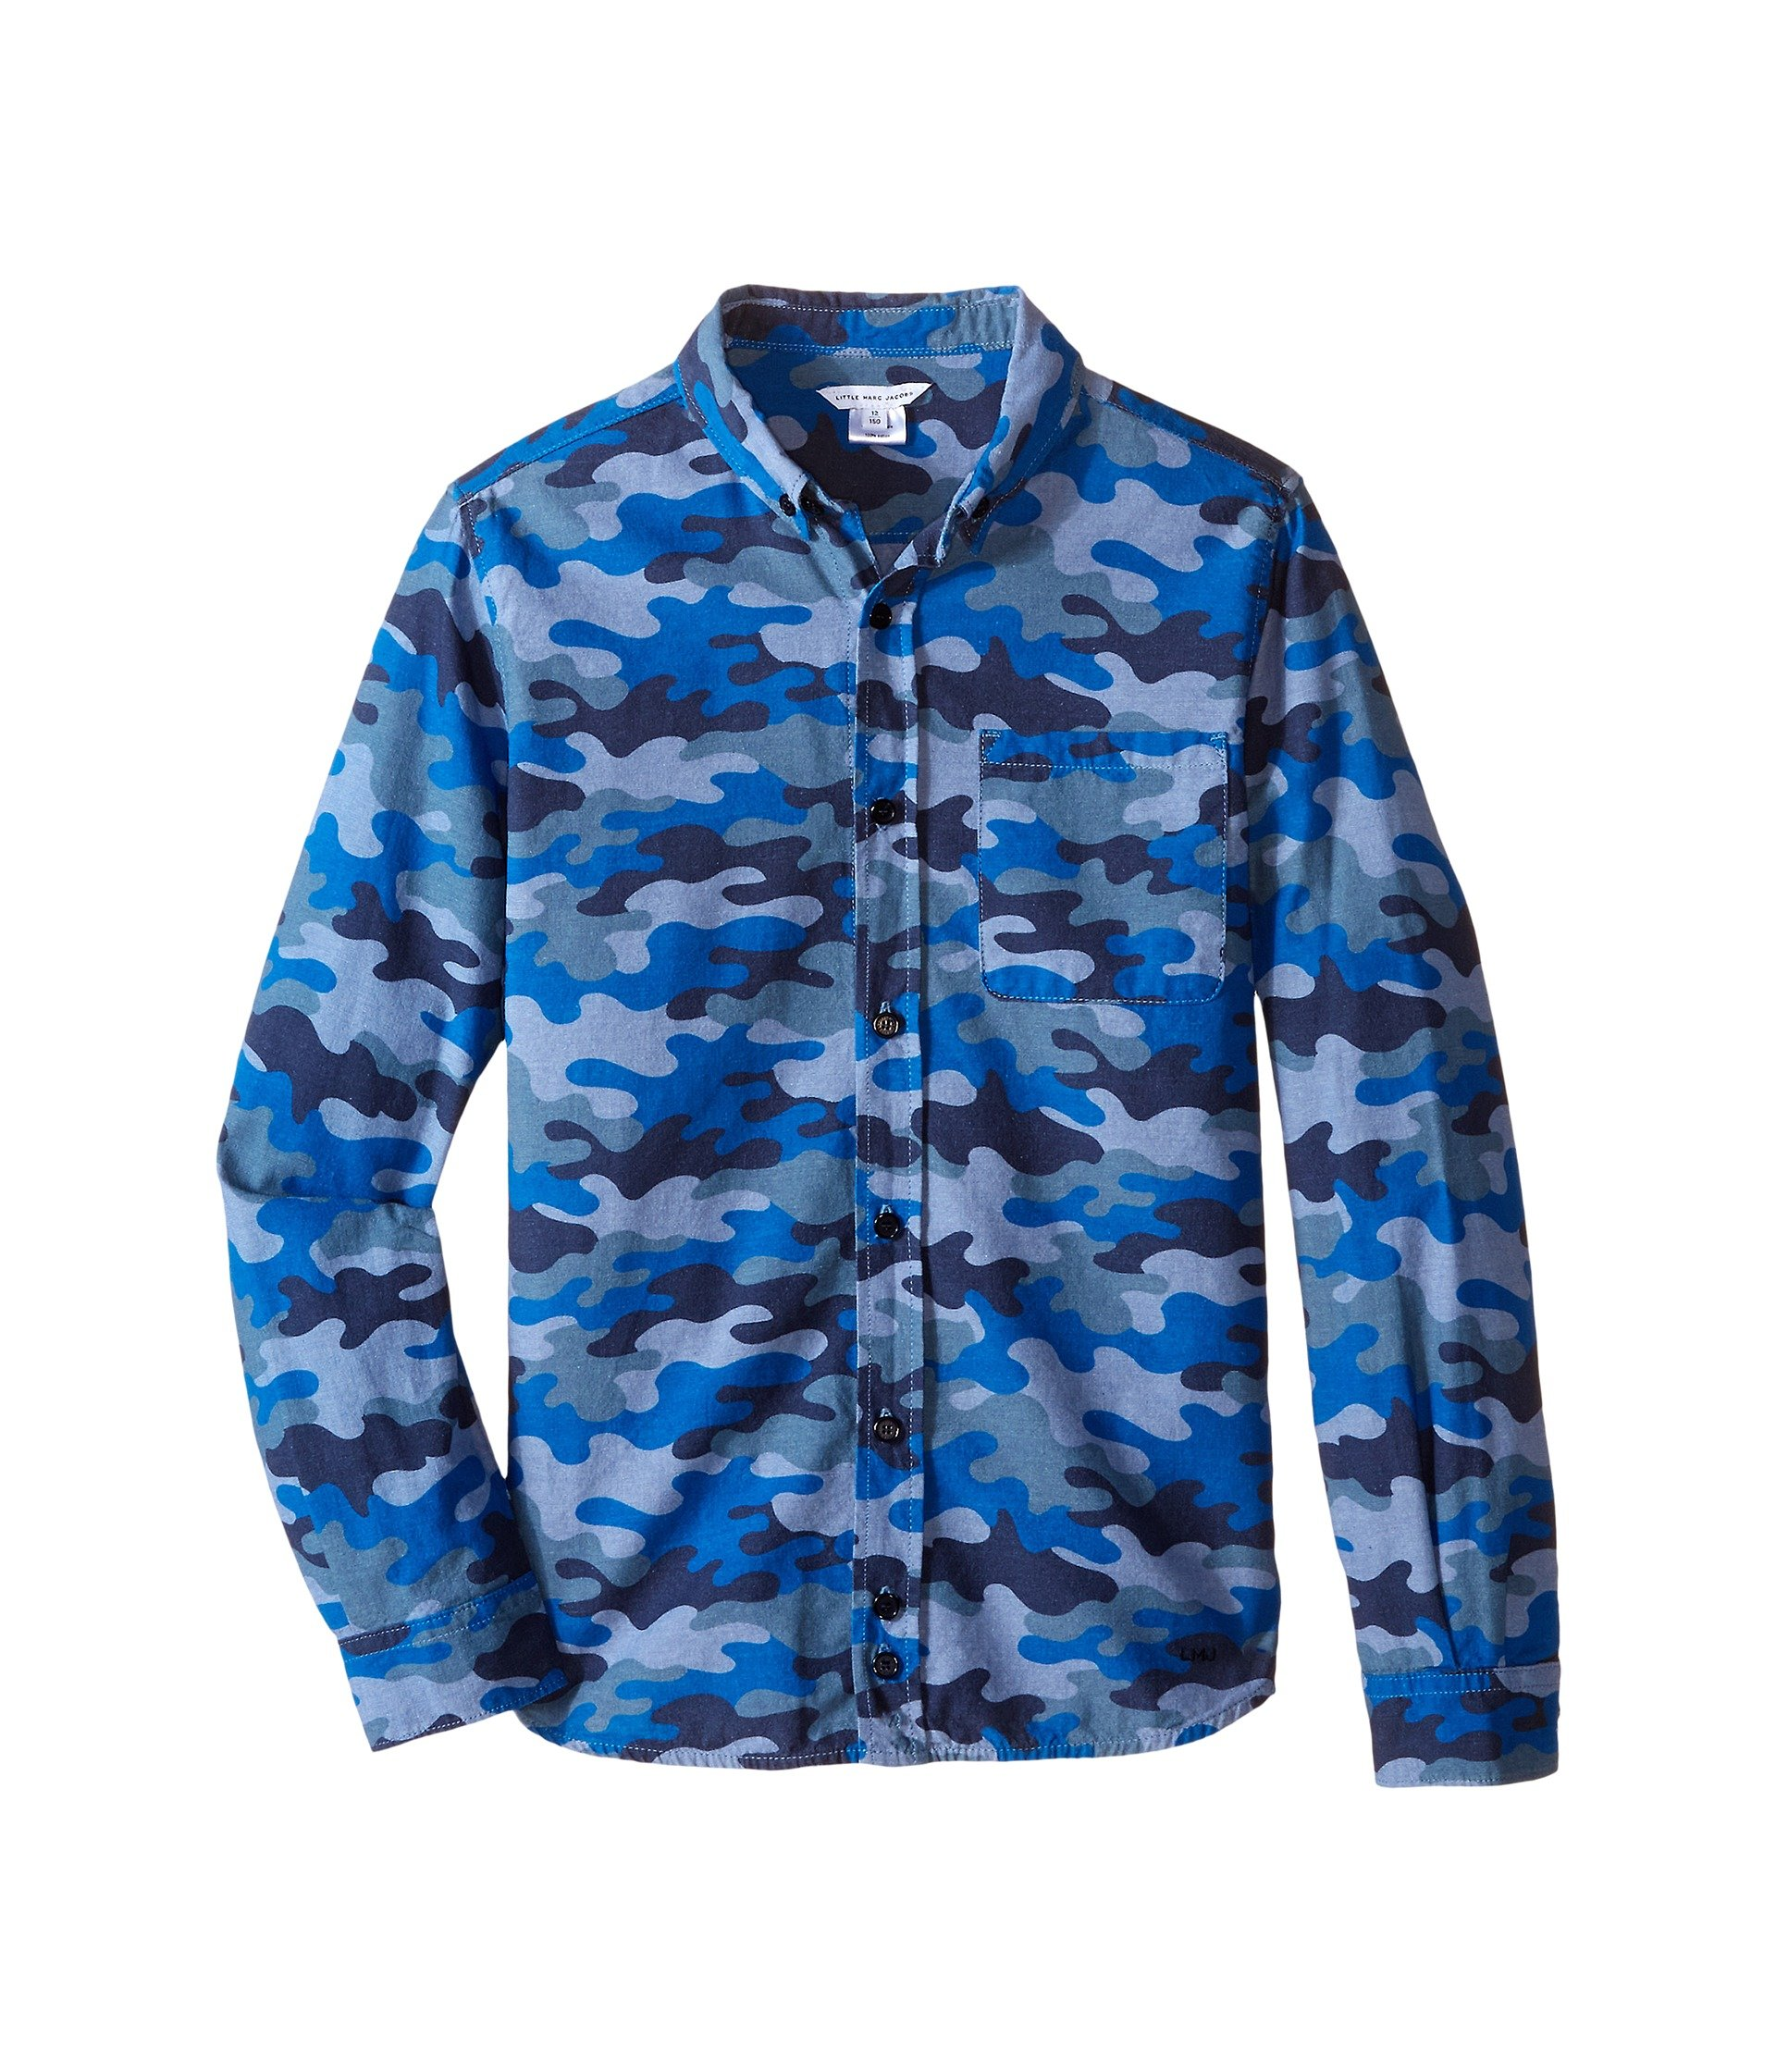 Little Marc Jacobs Boys Chambray Camoflage Shirt (Big Kids), Denim Blue, 12L by Little Marc Jacobs (Image #1)